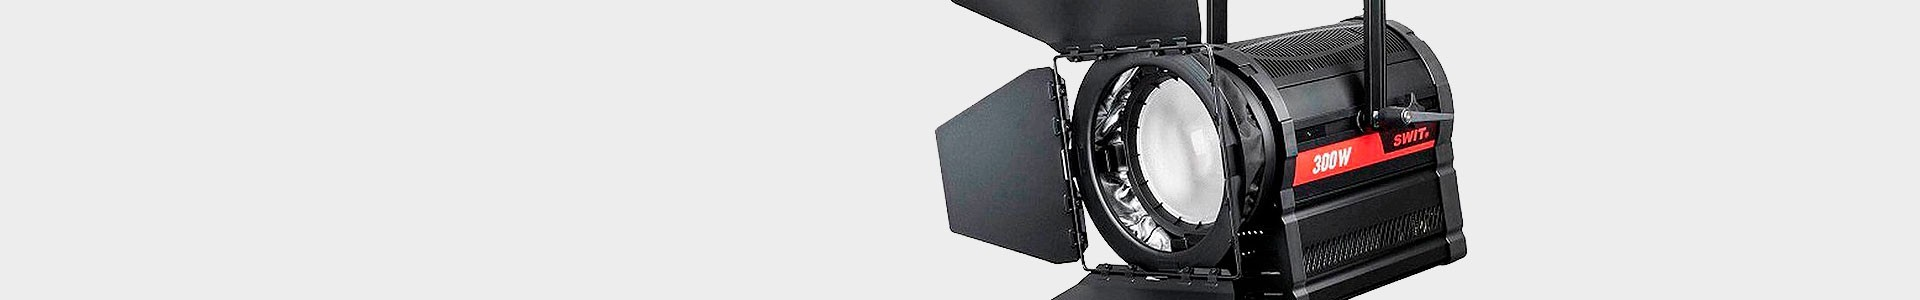 Faretti Fresnel a LED per Cinema o Video - Avacab